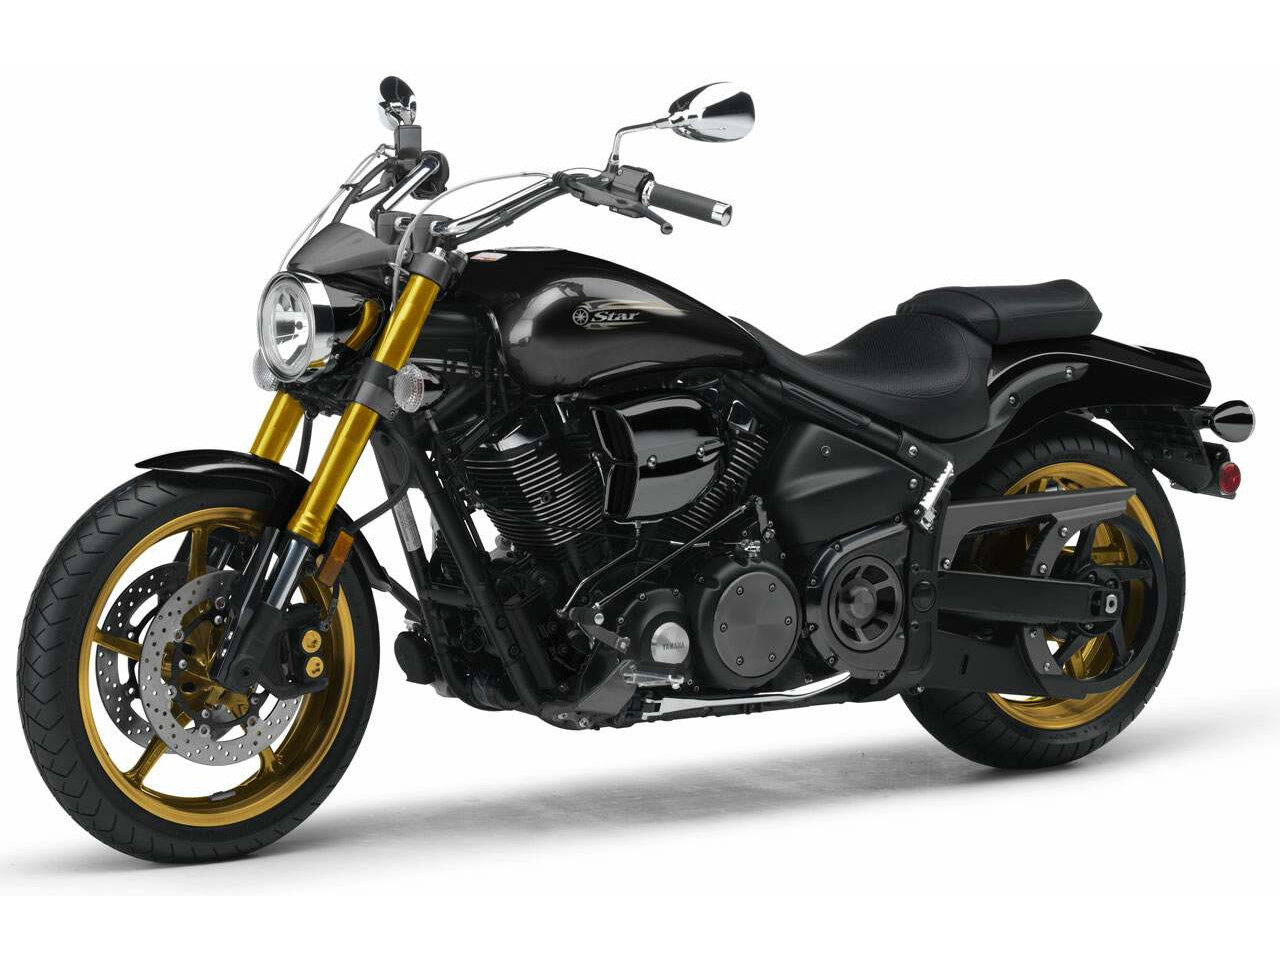 Yamaha XV 1700 Road Star Midnight Warrior 2